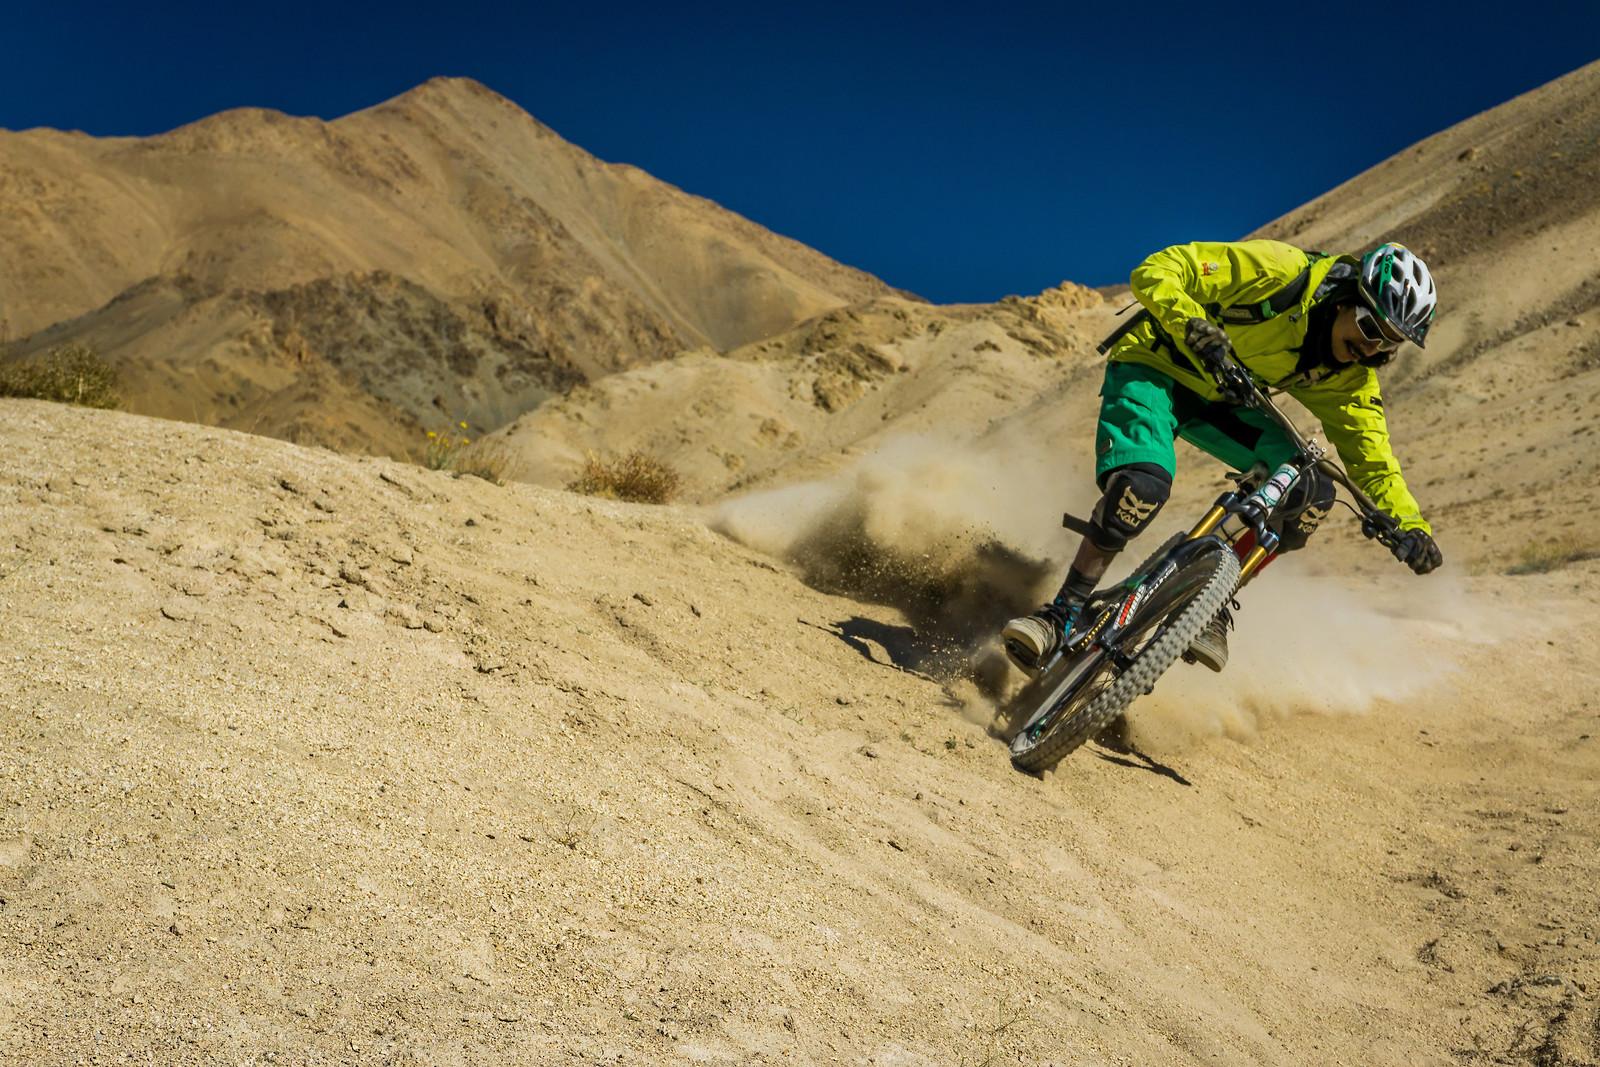 Vinay Menon Ladakh (1 of 1) - Malcolm Mclaws - Mountain Biking Pictures - Vital MTB